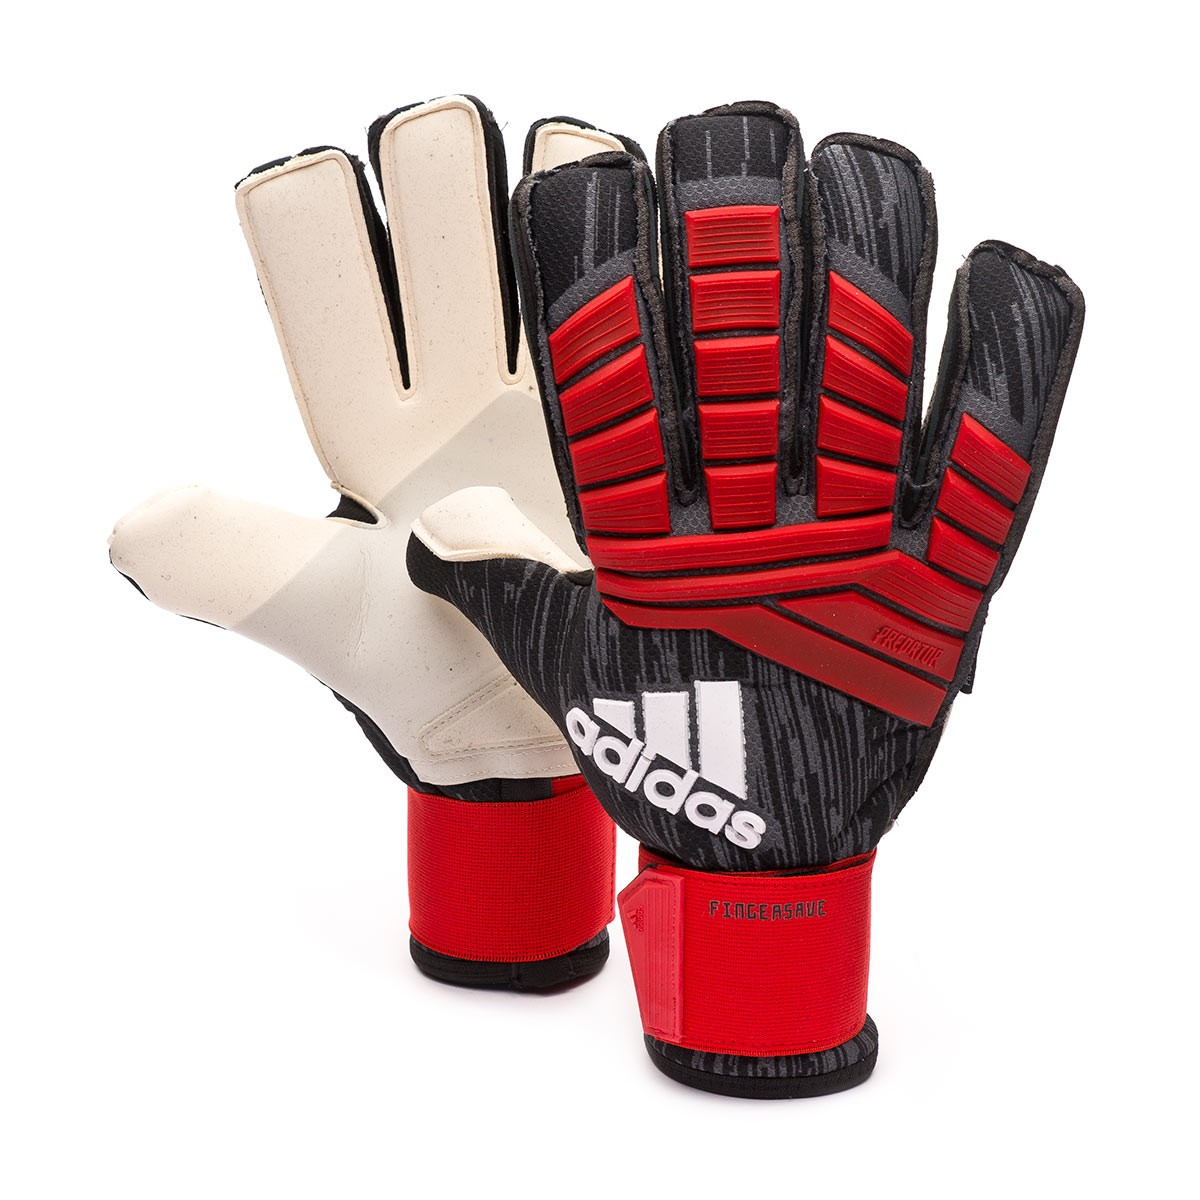 ee6541a5675e Glove adidas Predator Pro Fingersave Black-Red-White - Football store  Fútbol Emotion